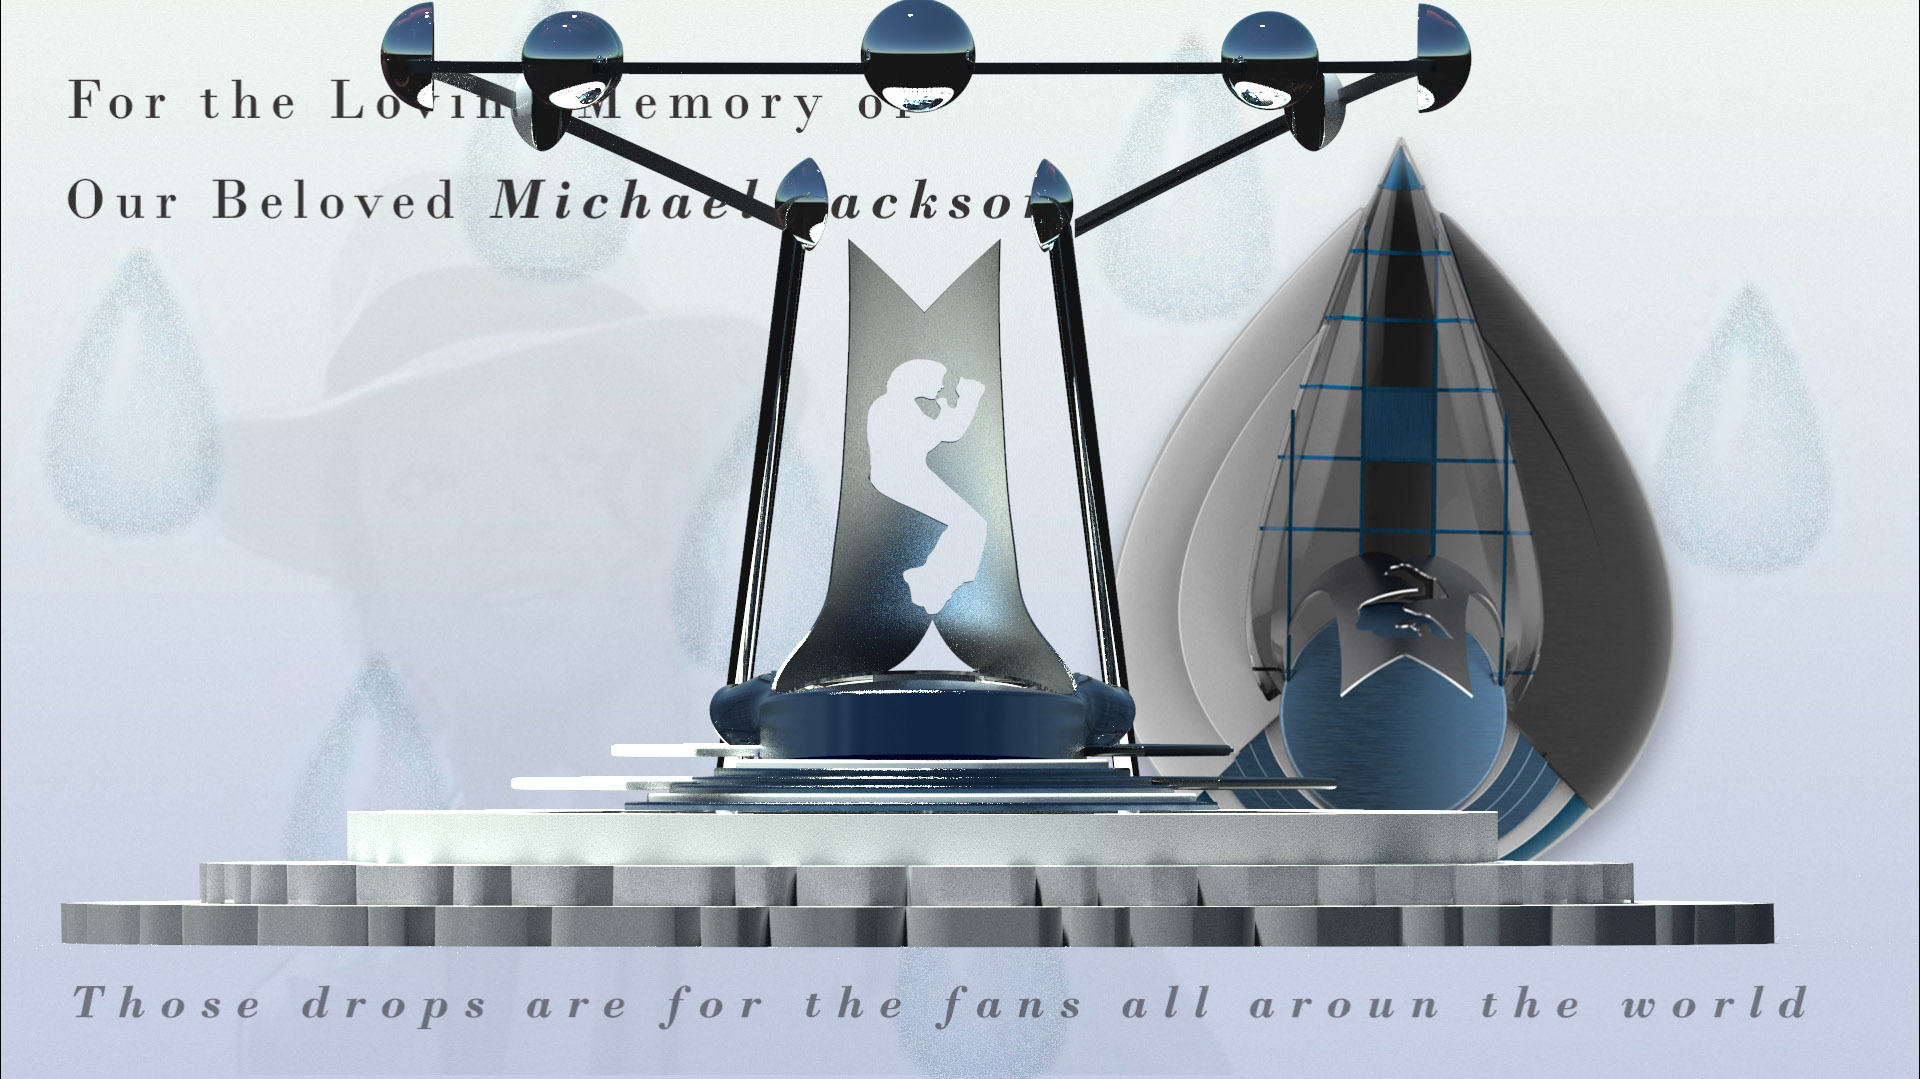 Michael-Jackson-Loving-Memory